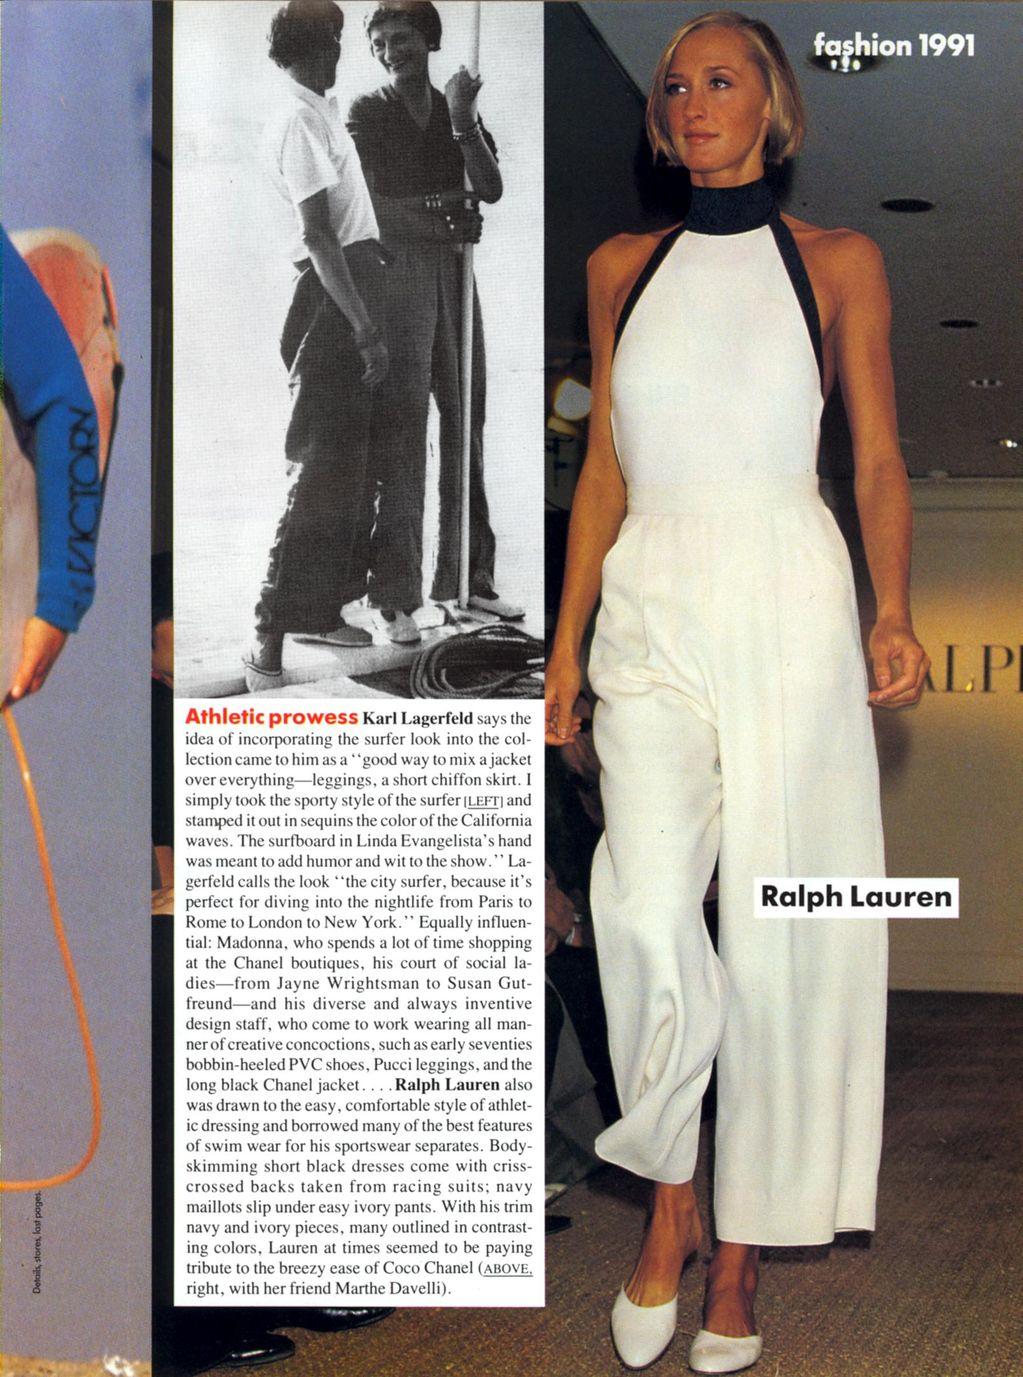 Vogue (US) January 1991 | Fashion 1991 04.jpg